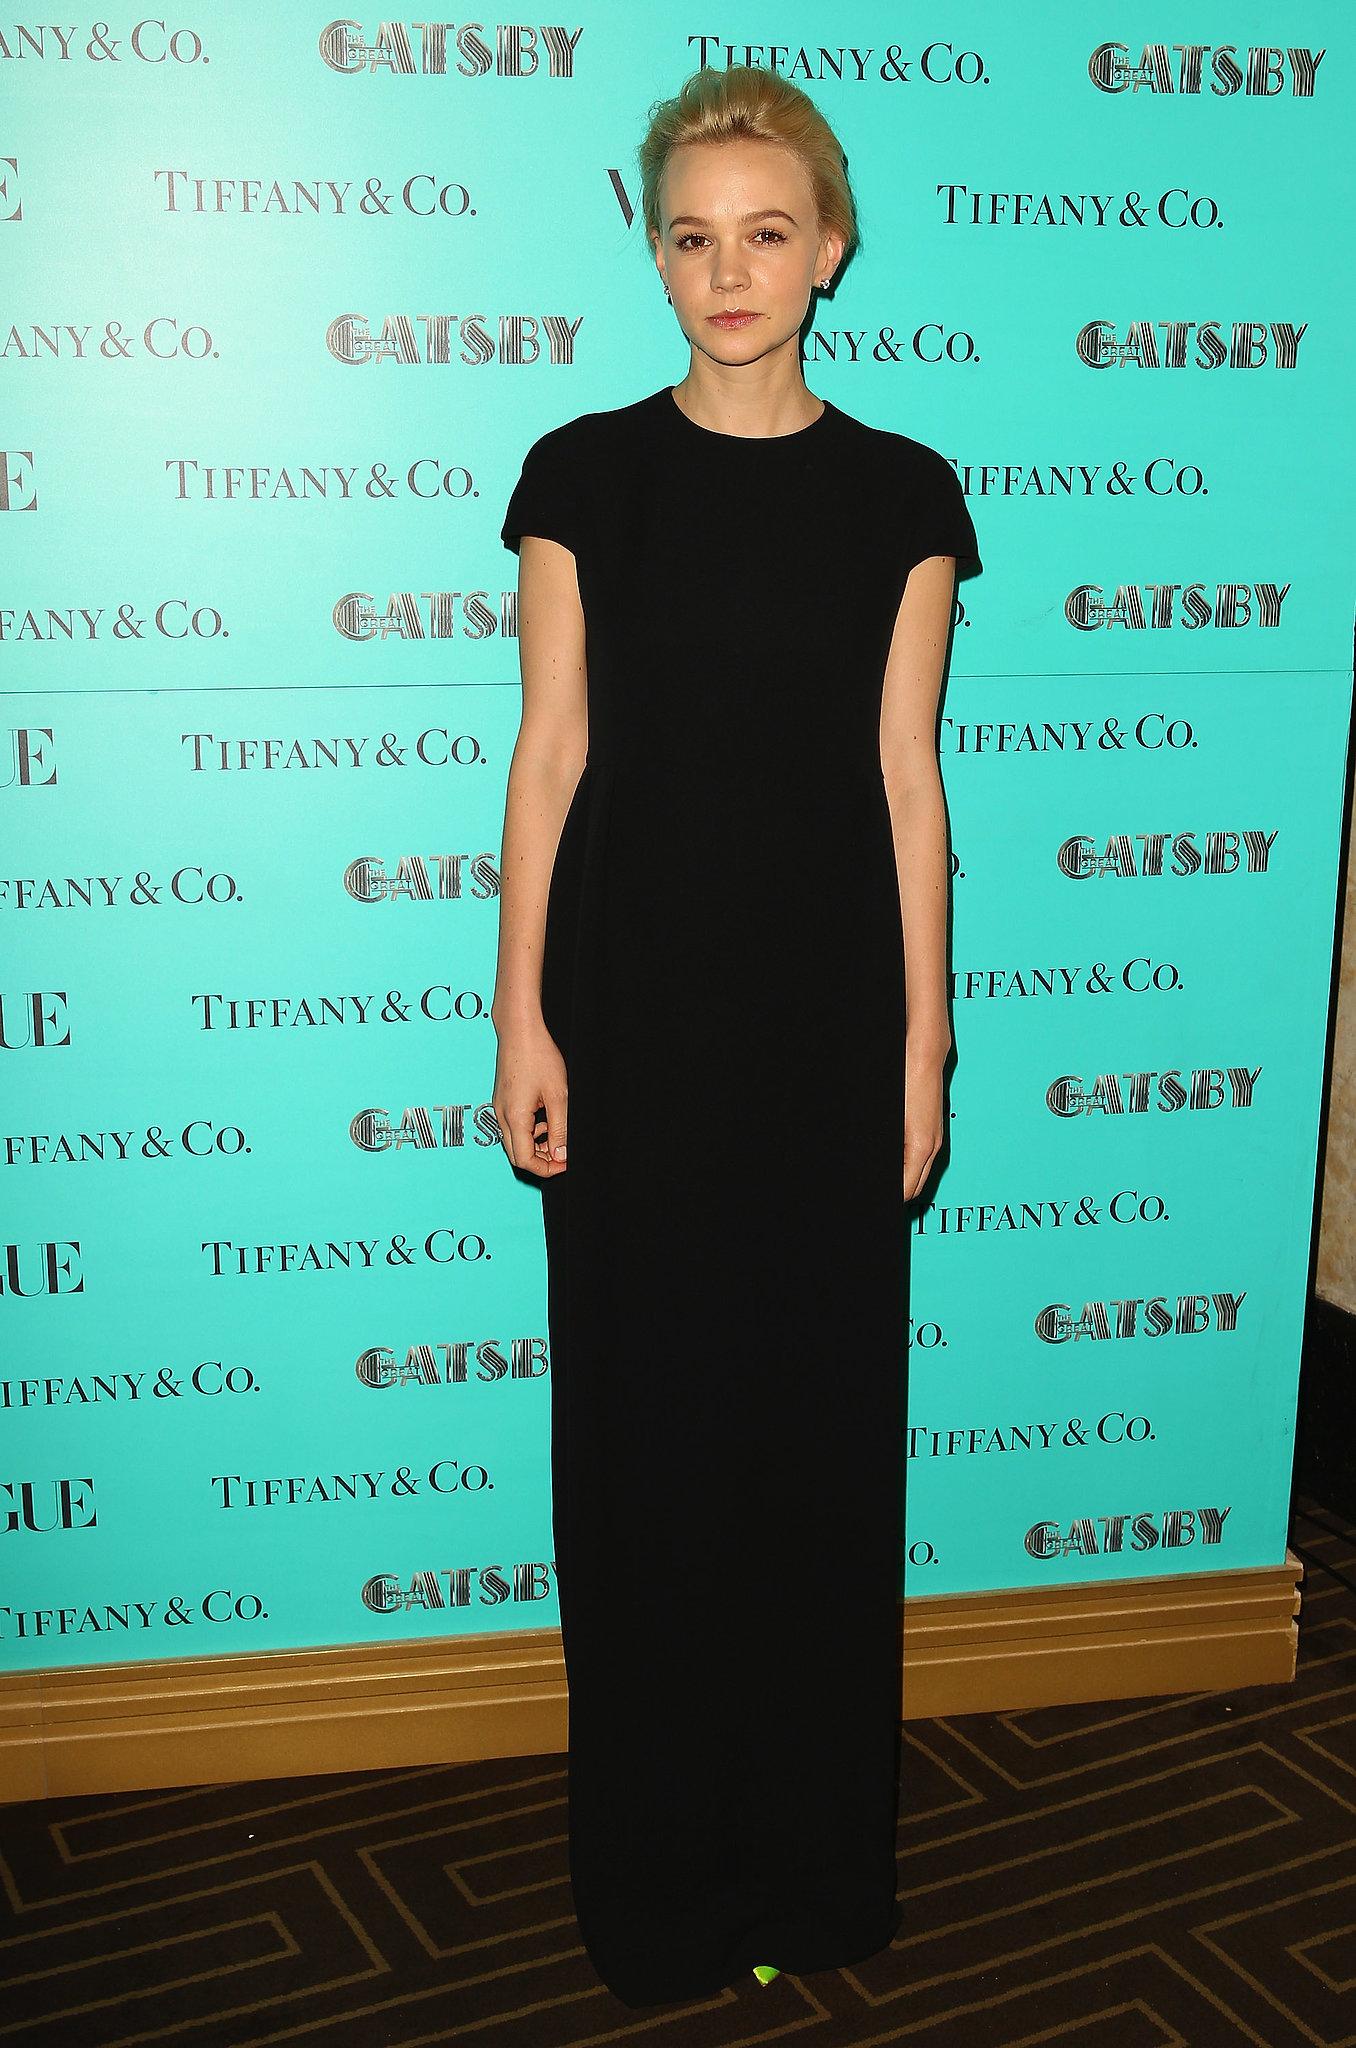 Carey Mulligan in Black Dior at the 2013 Tiffany & Co. Great Gatsby Dinner